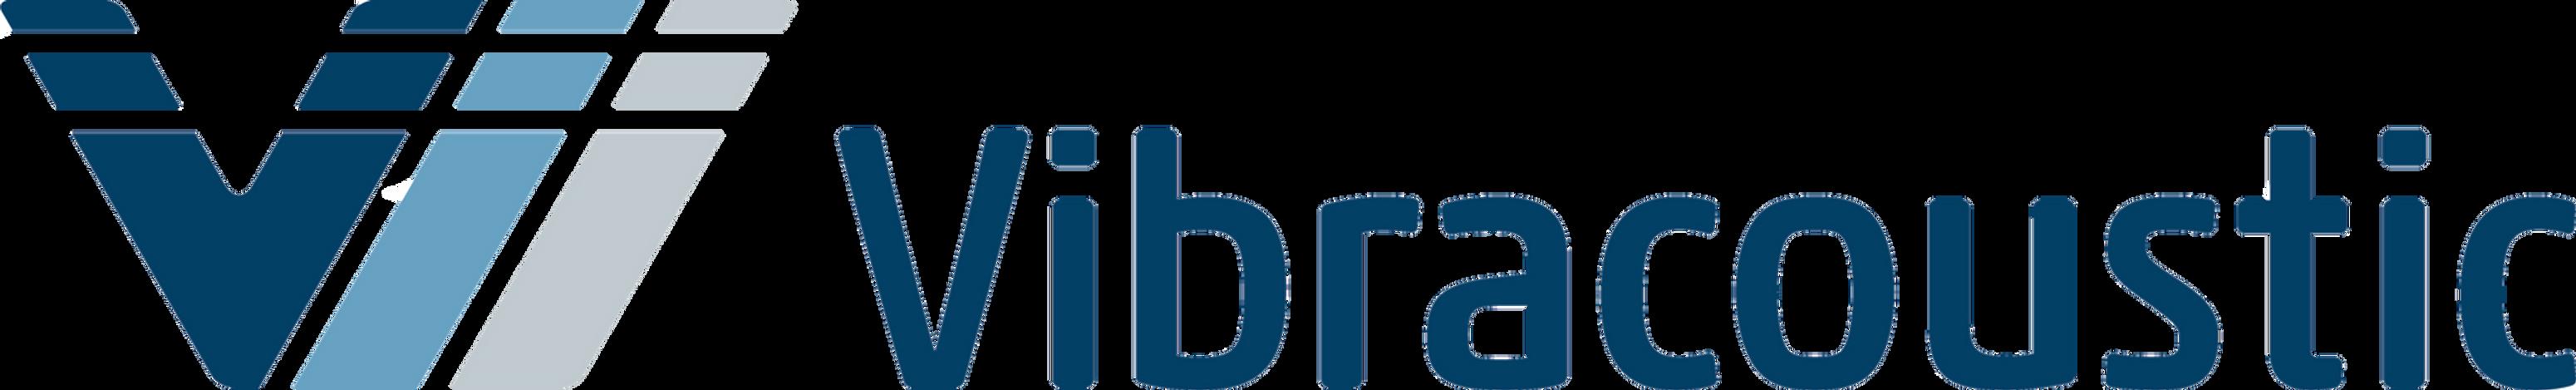 Vibracoustic_Logo_4c_new1807_L.png